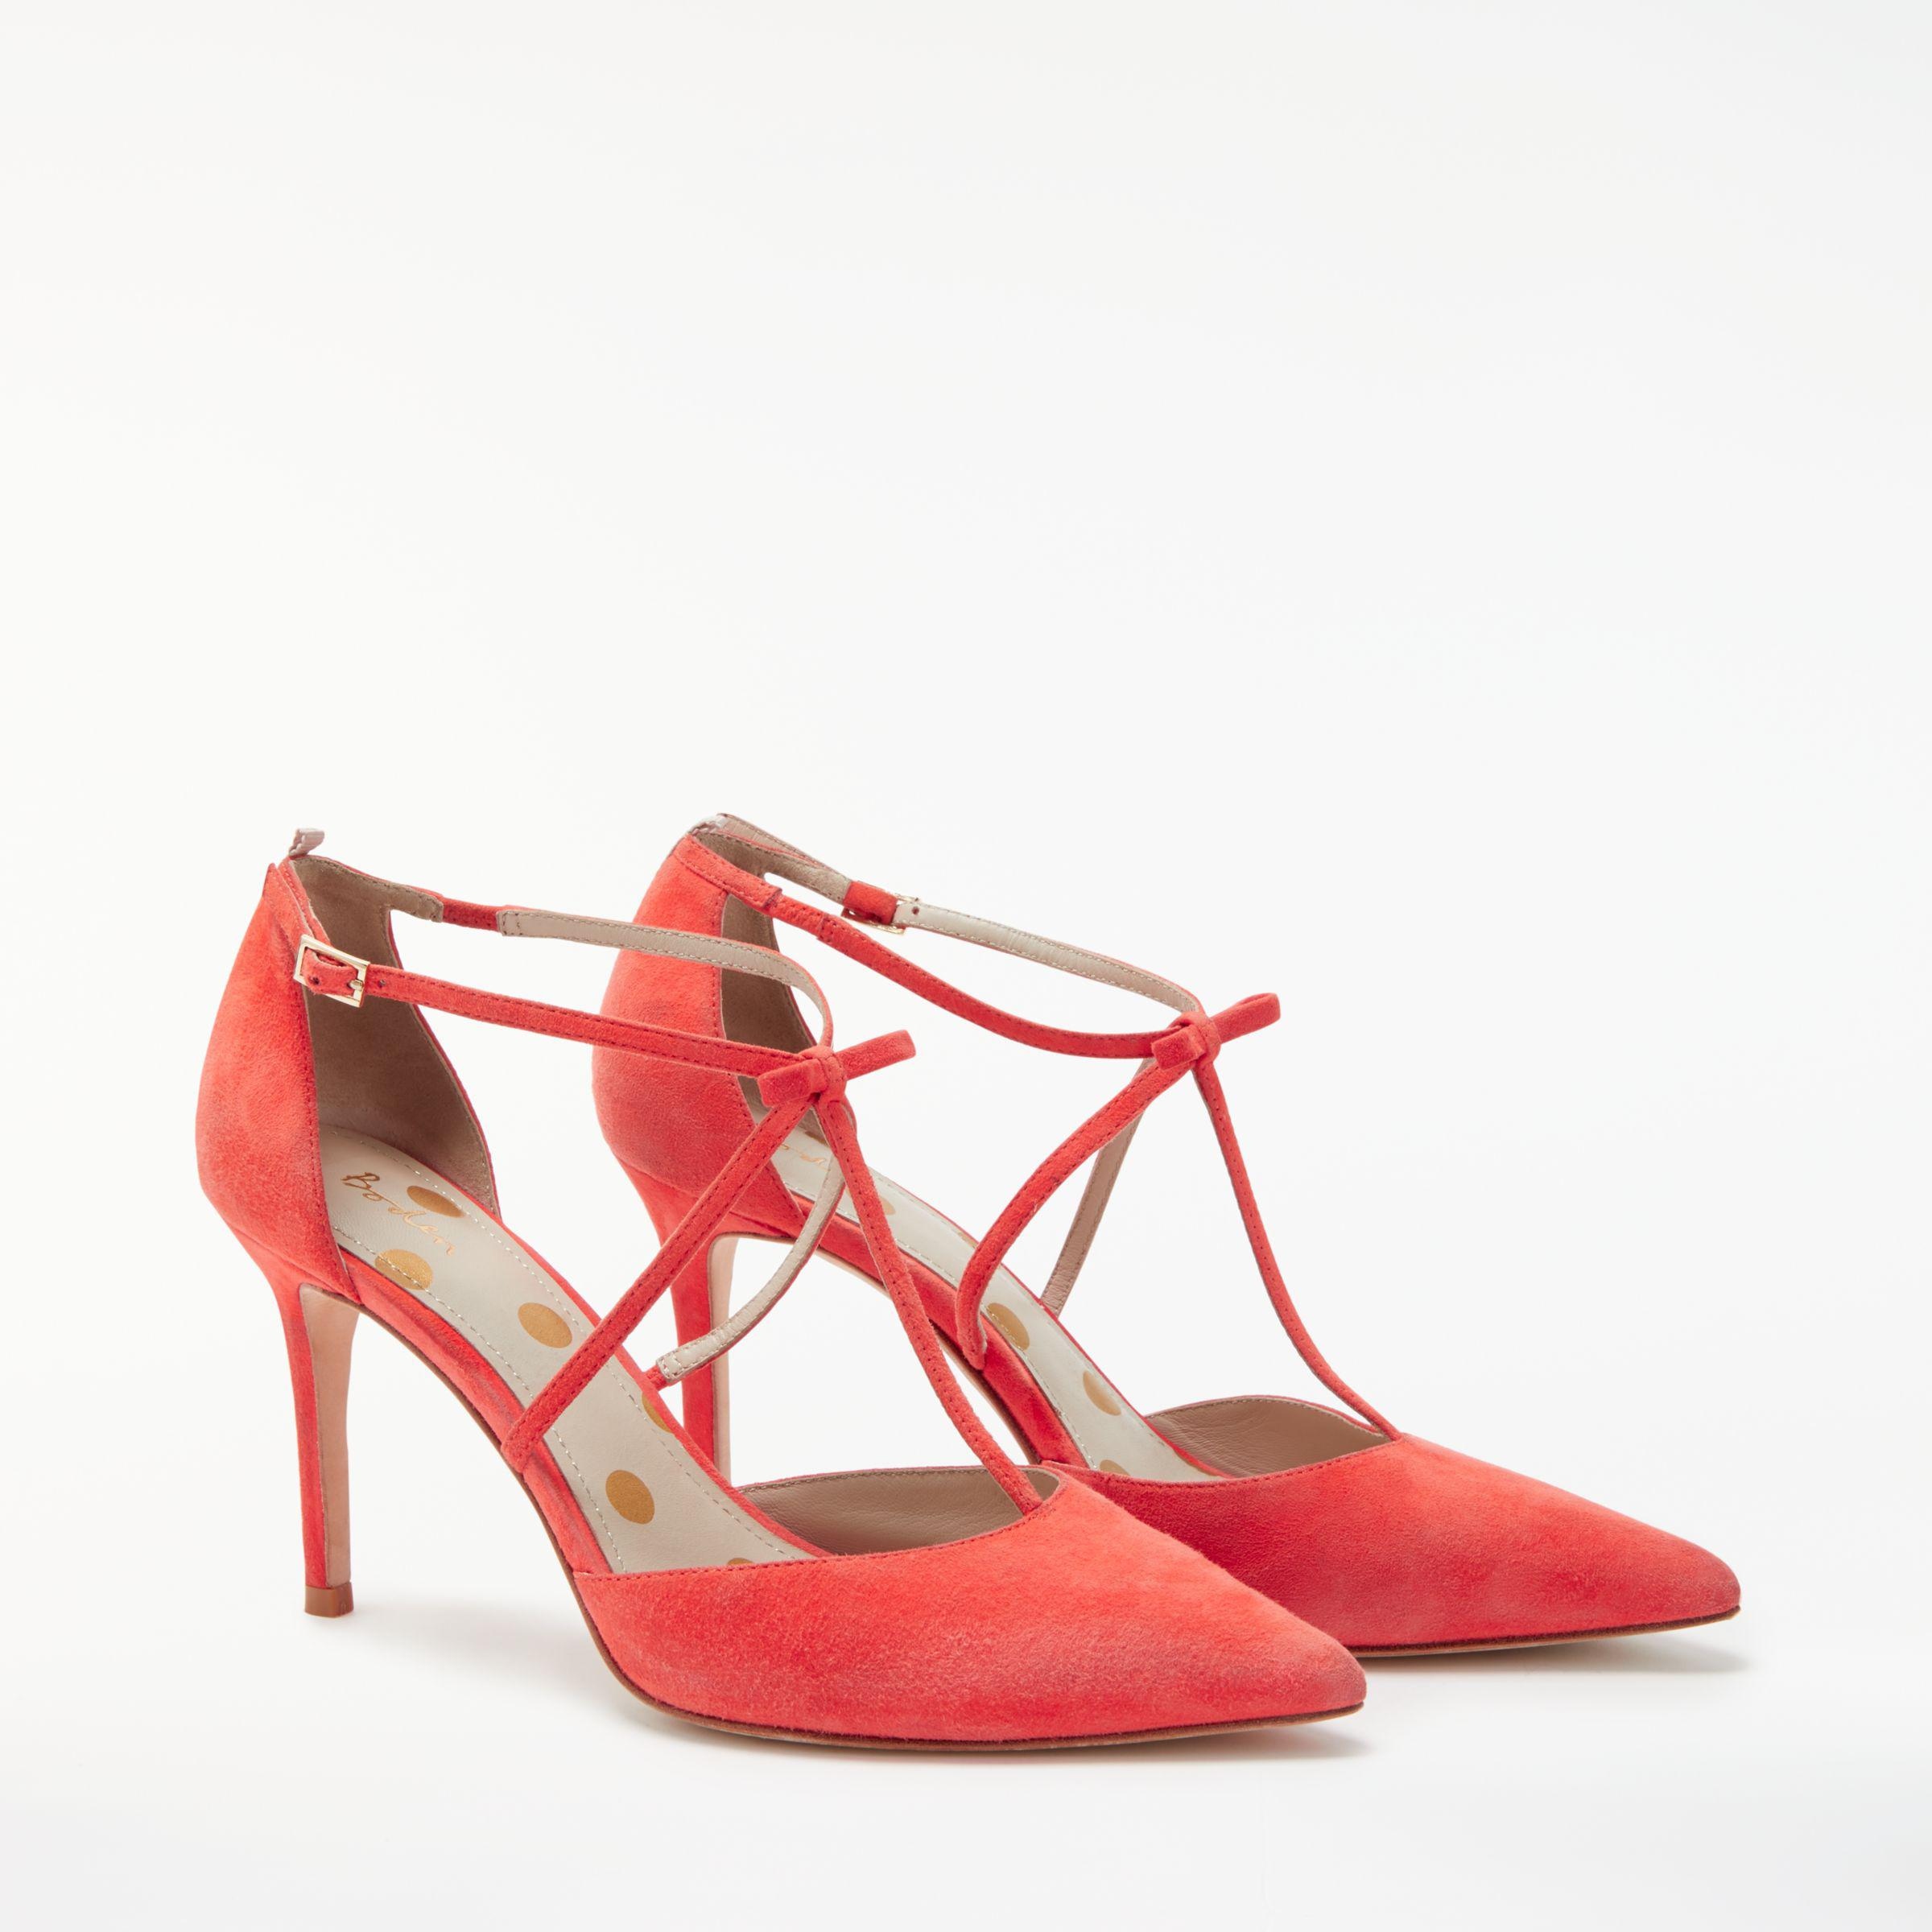 6e5fdd526784 Boden Jennifer T-bar Court Shoes in Red - Lyst